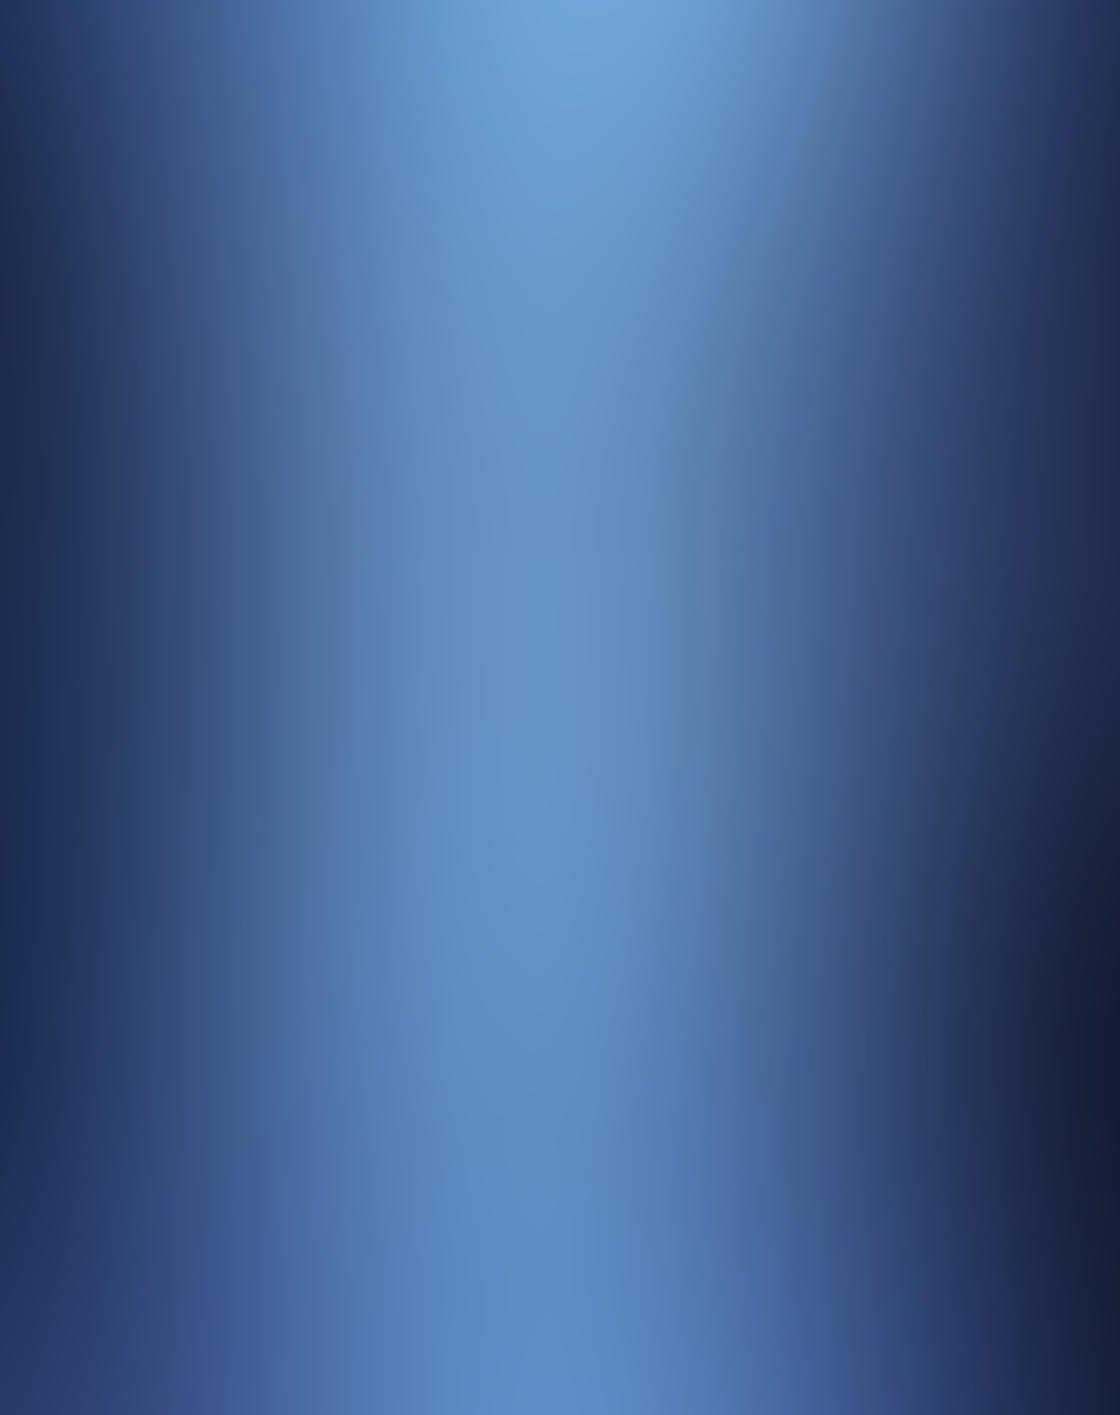 iPhone Photos Blue Color 27